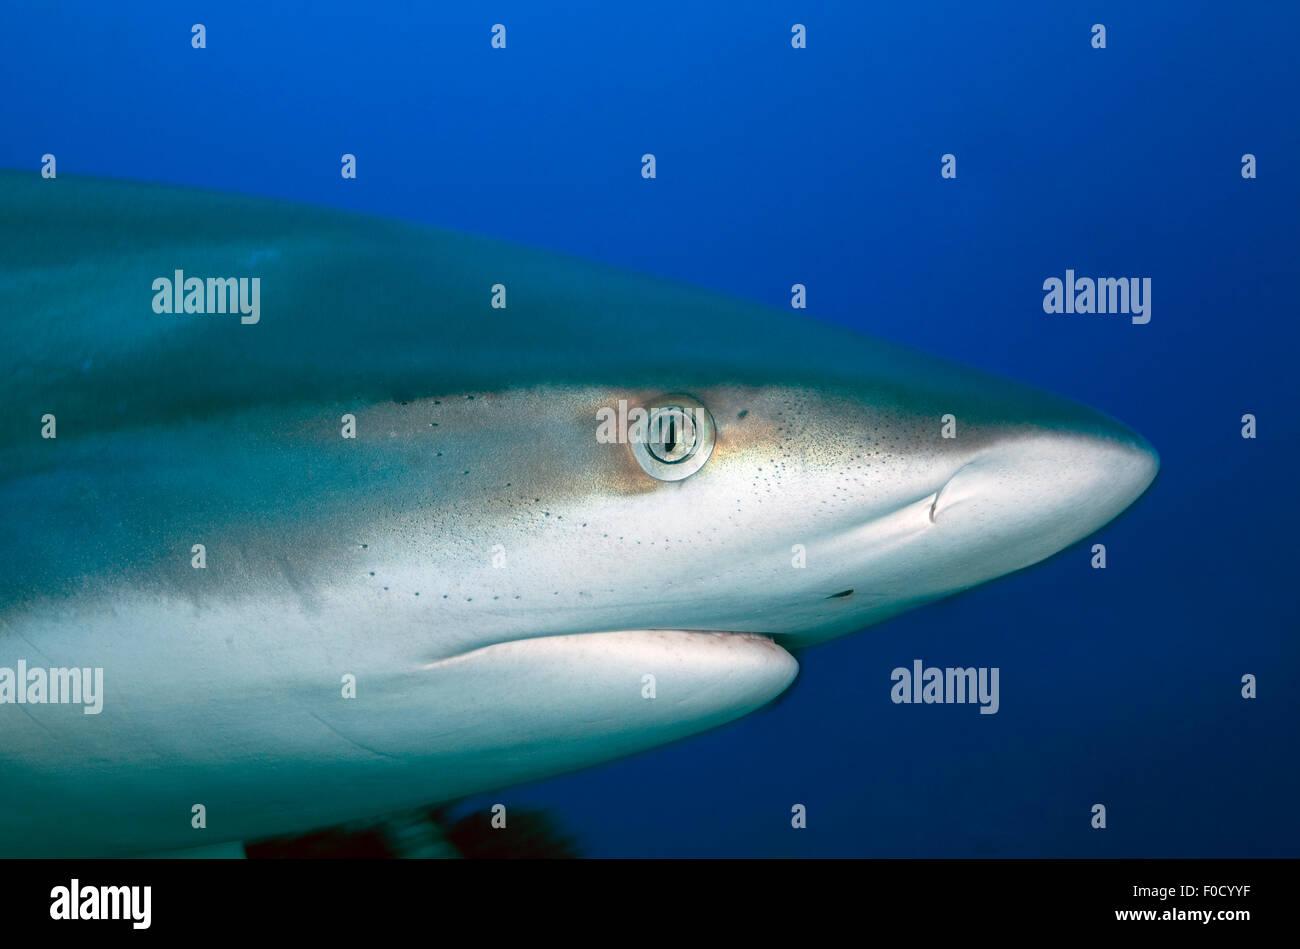 CLOSE-UP FACE OF SILVERTIP SHARK - Stock Image